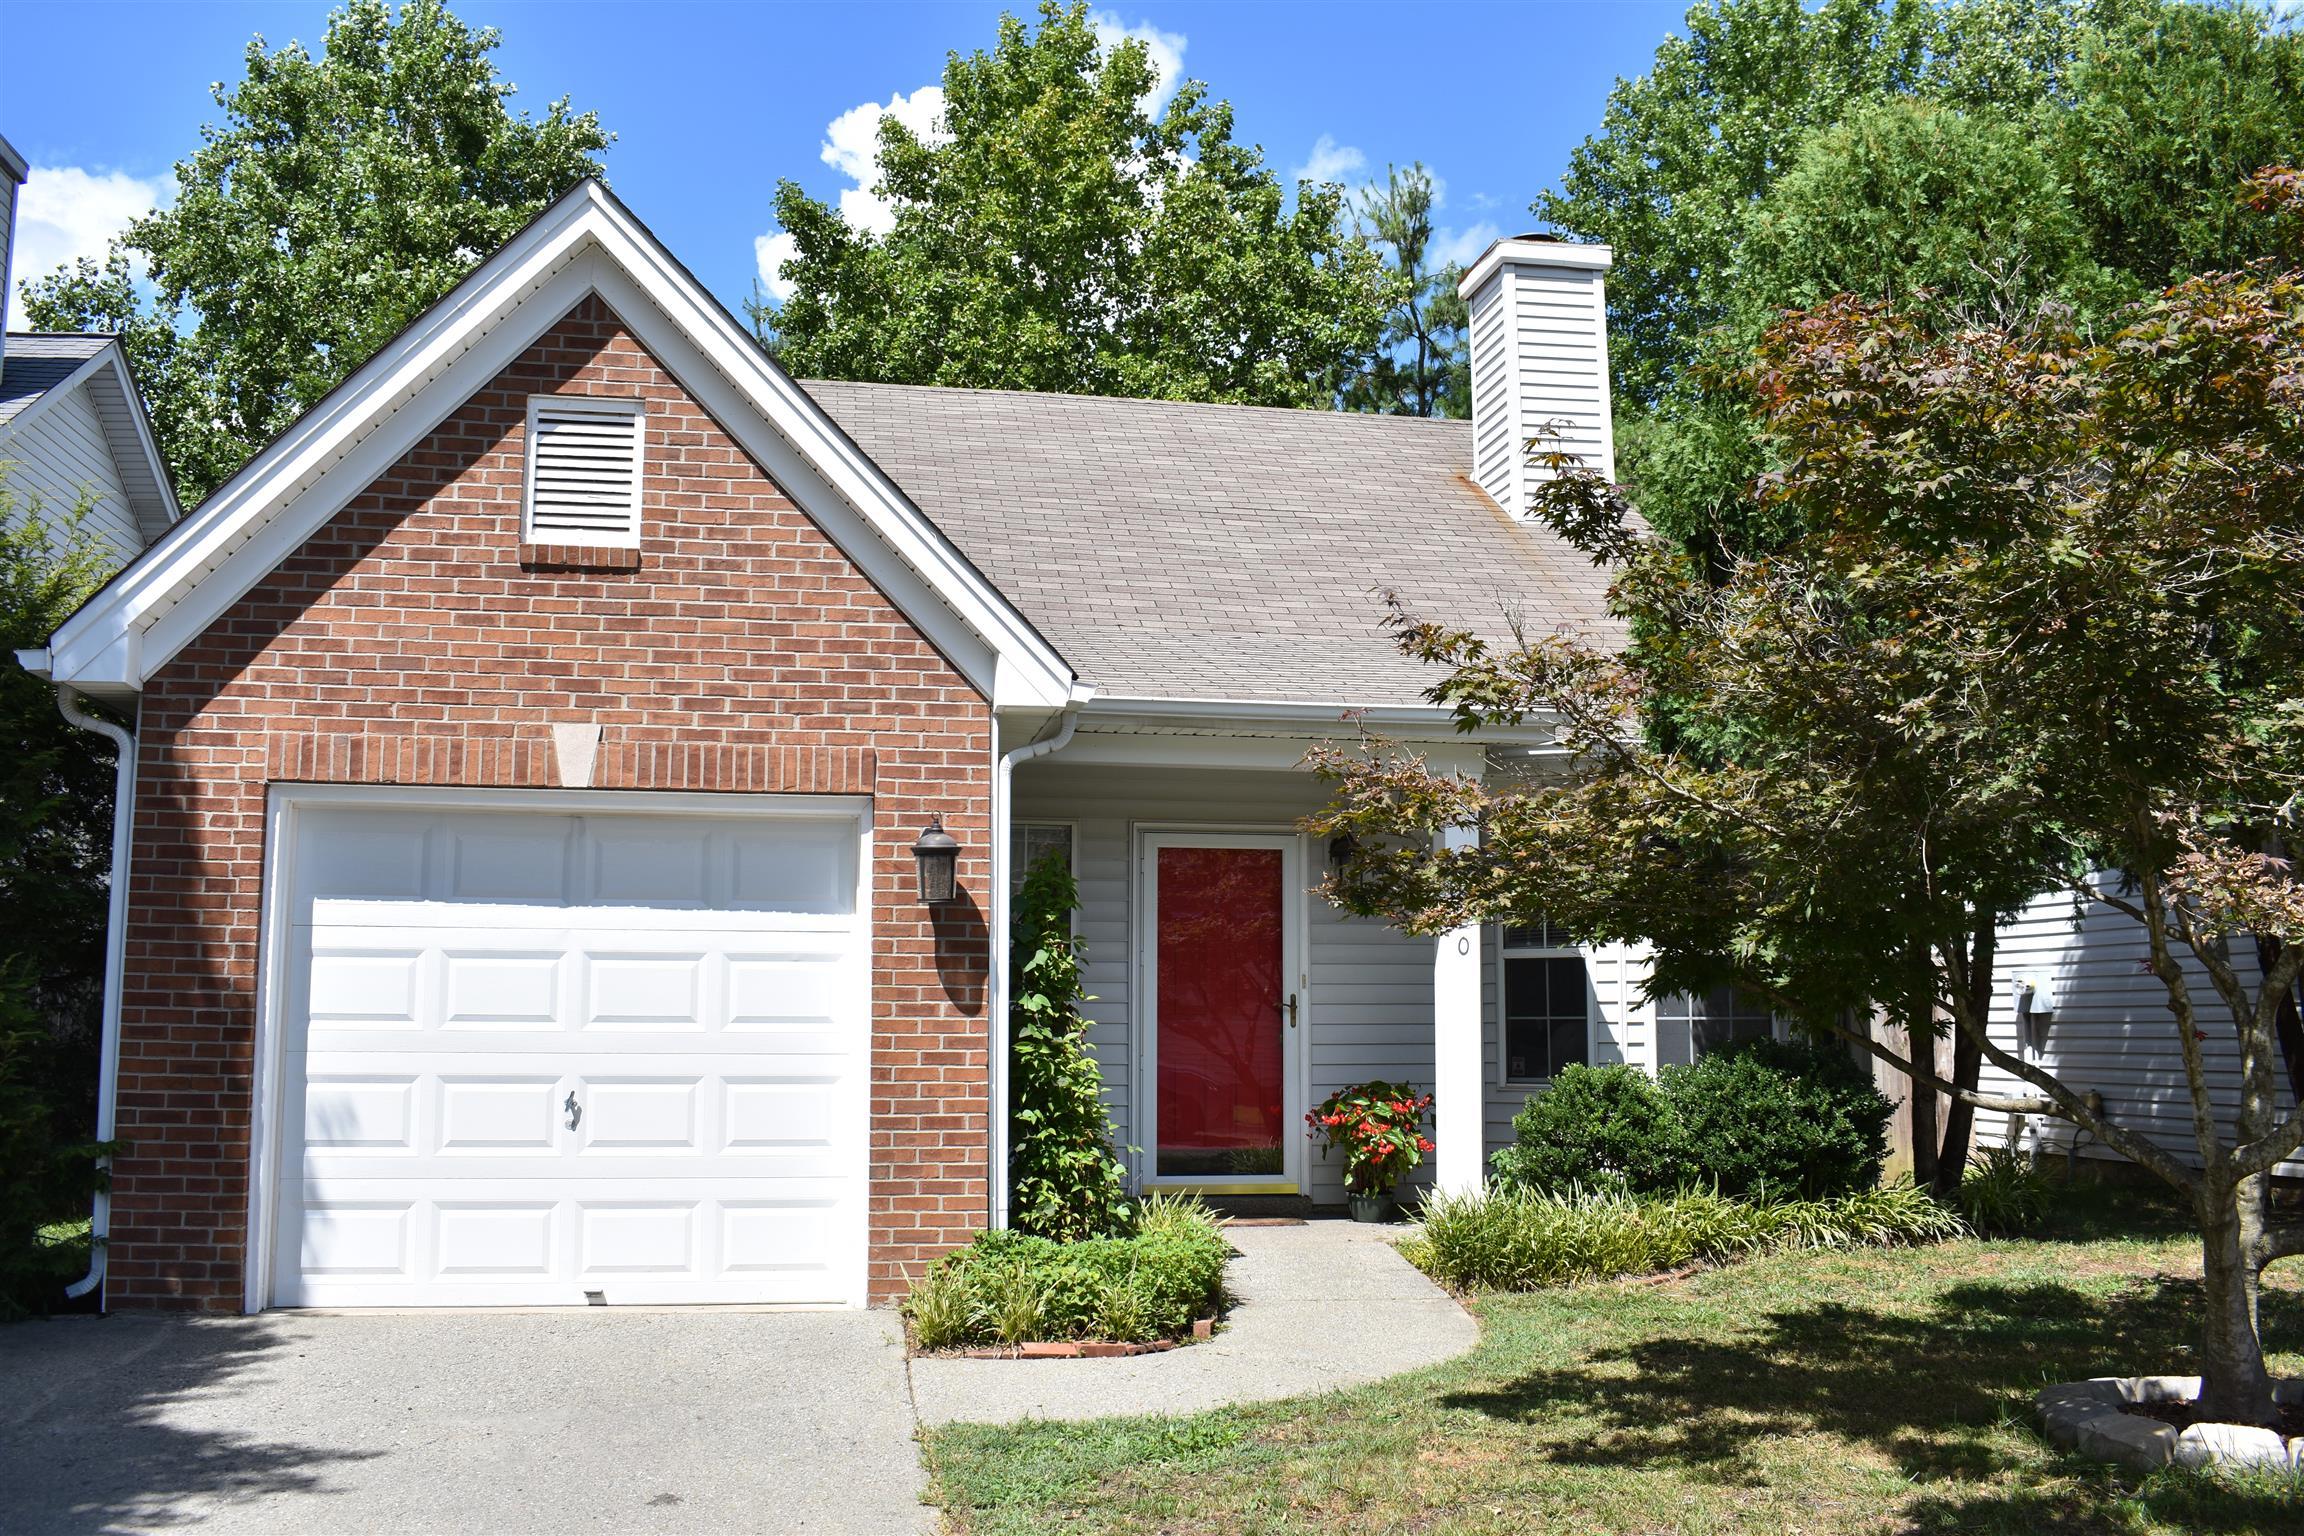 820 Brandyleigh Ct, Franklin, TN 37069 - Franklin, TN real estate listing